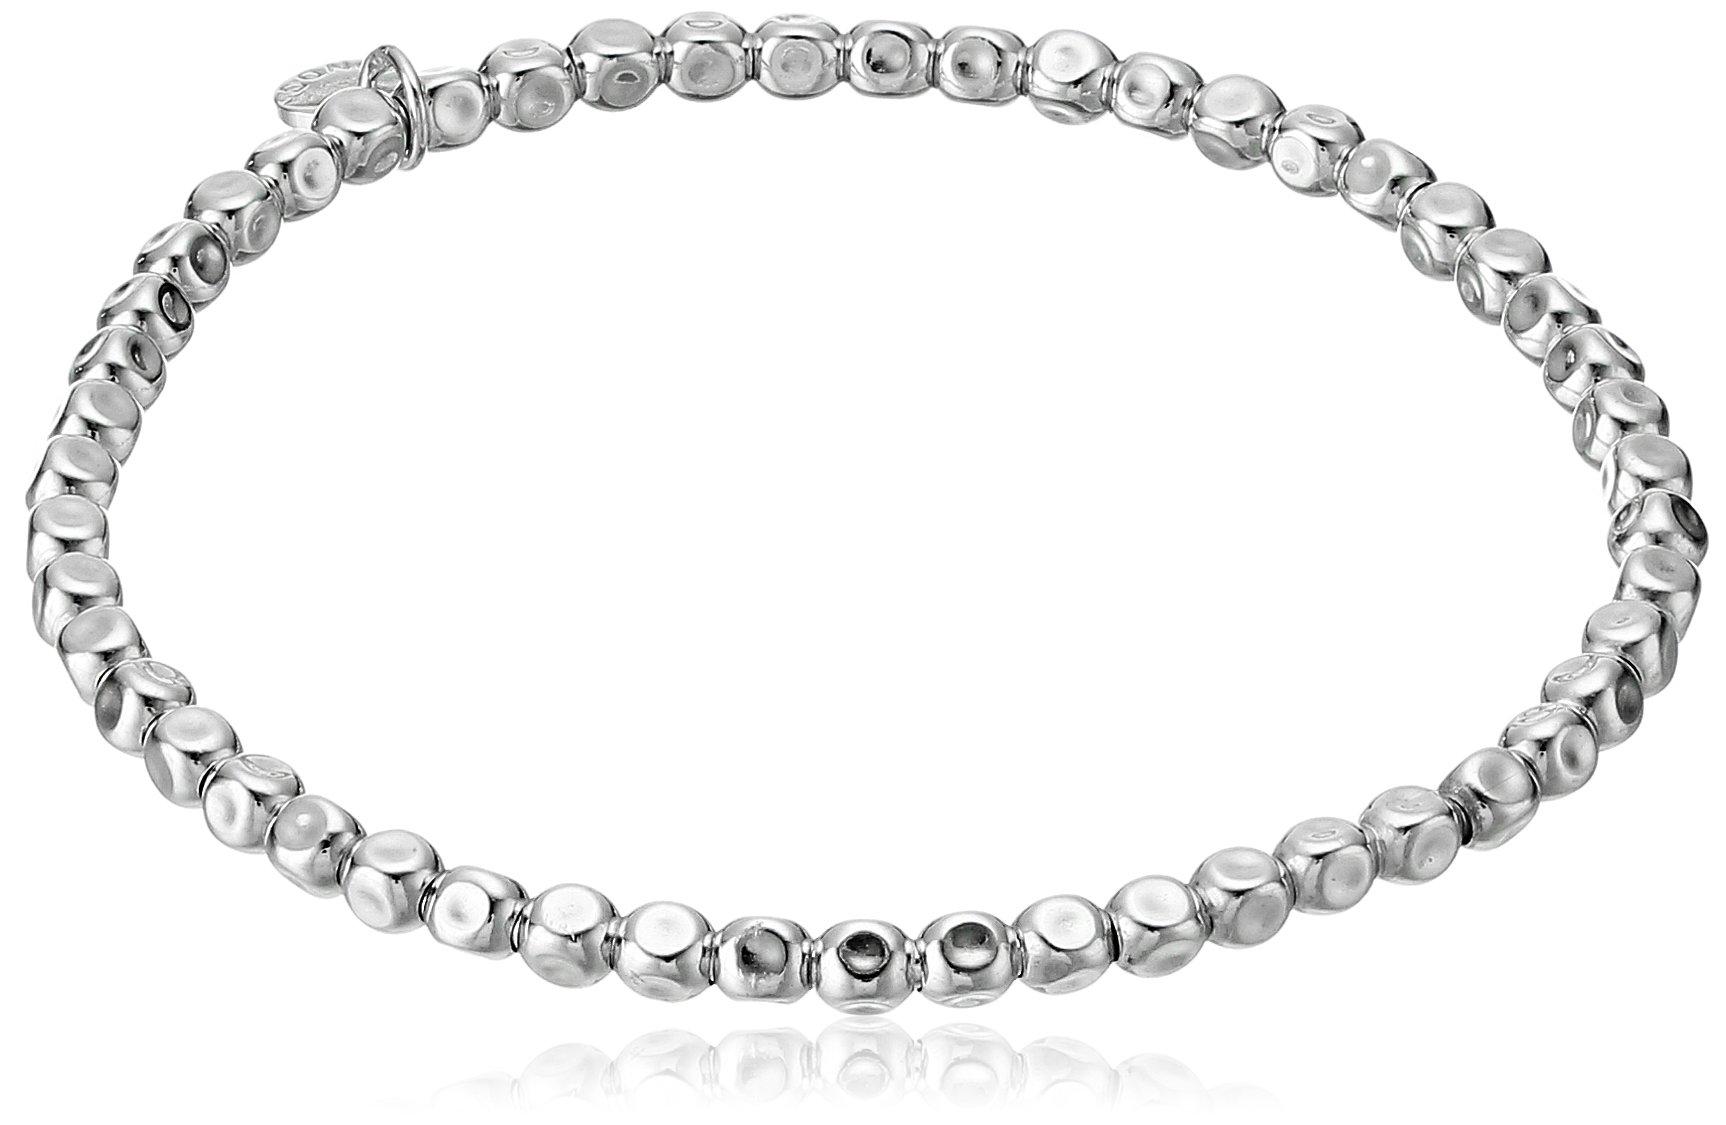 Tateossian Silver Plain SilColor 17.50cm 4mm Cube beads Elasticated Medium Bracelet